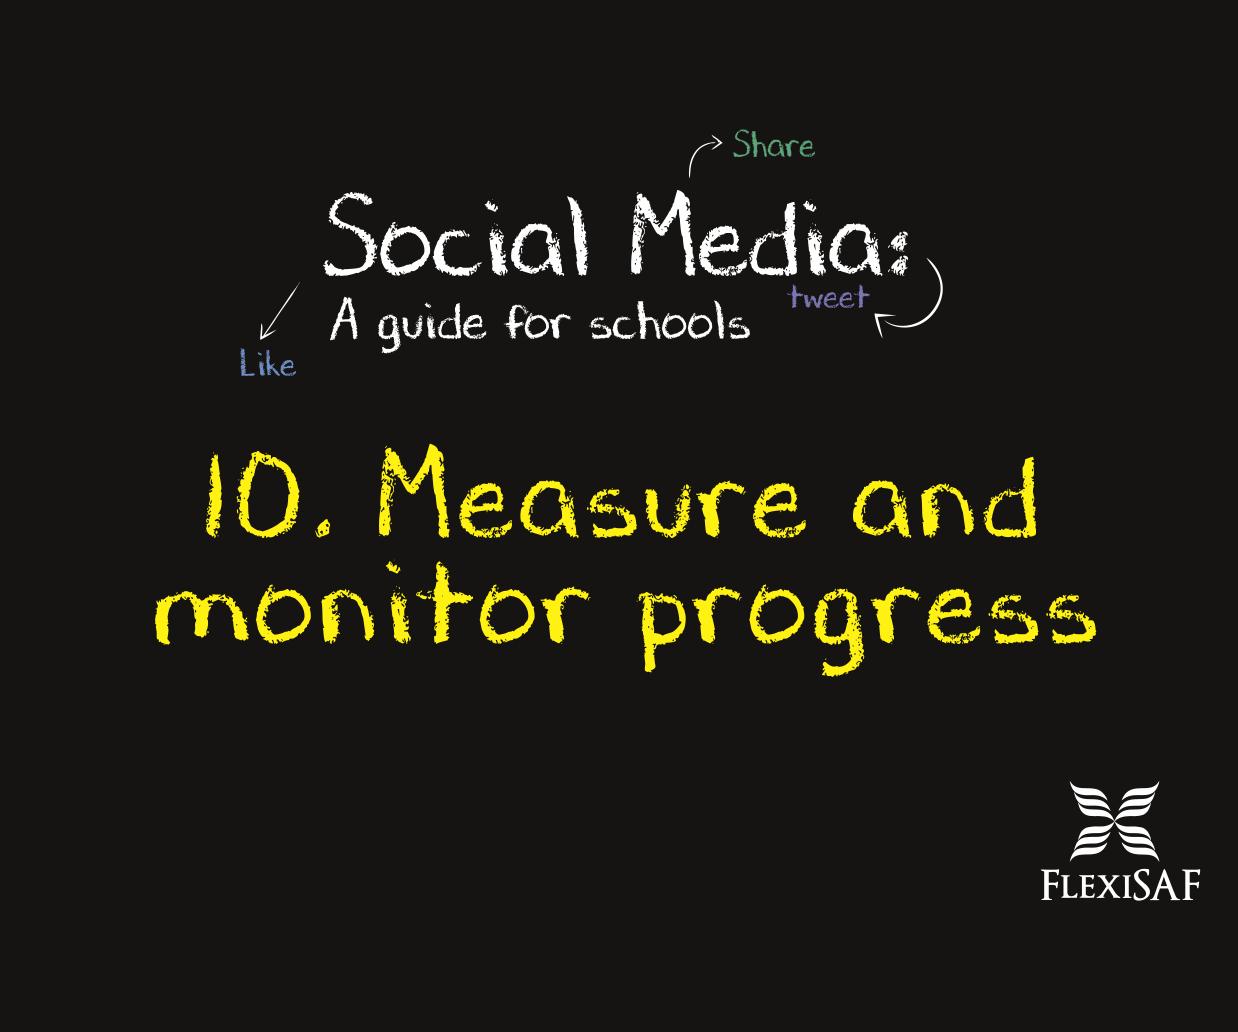 10. Measure and monitor progress